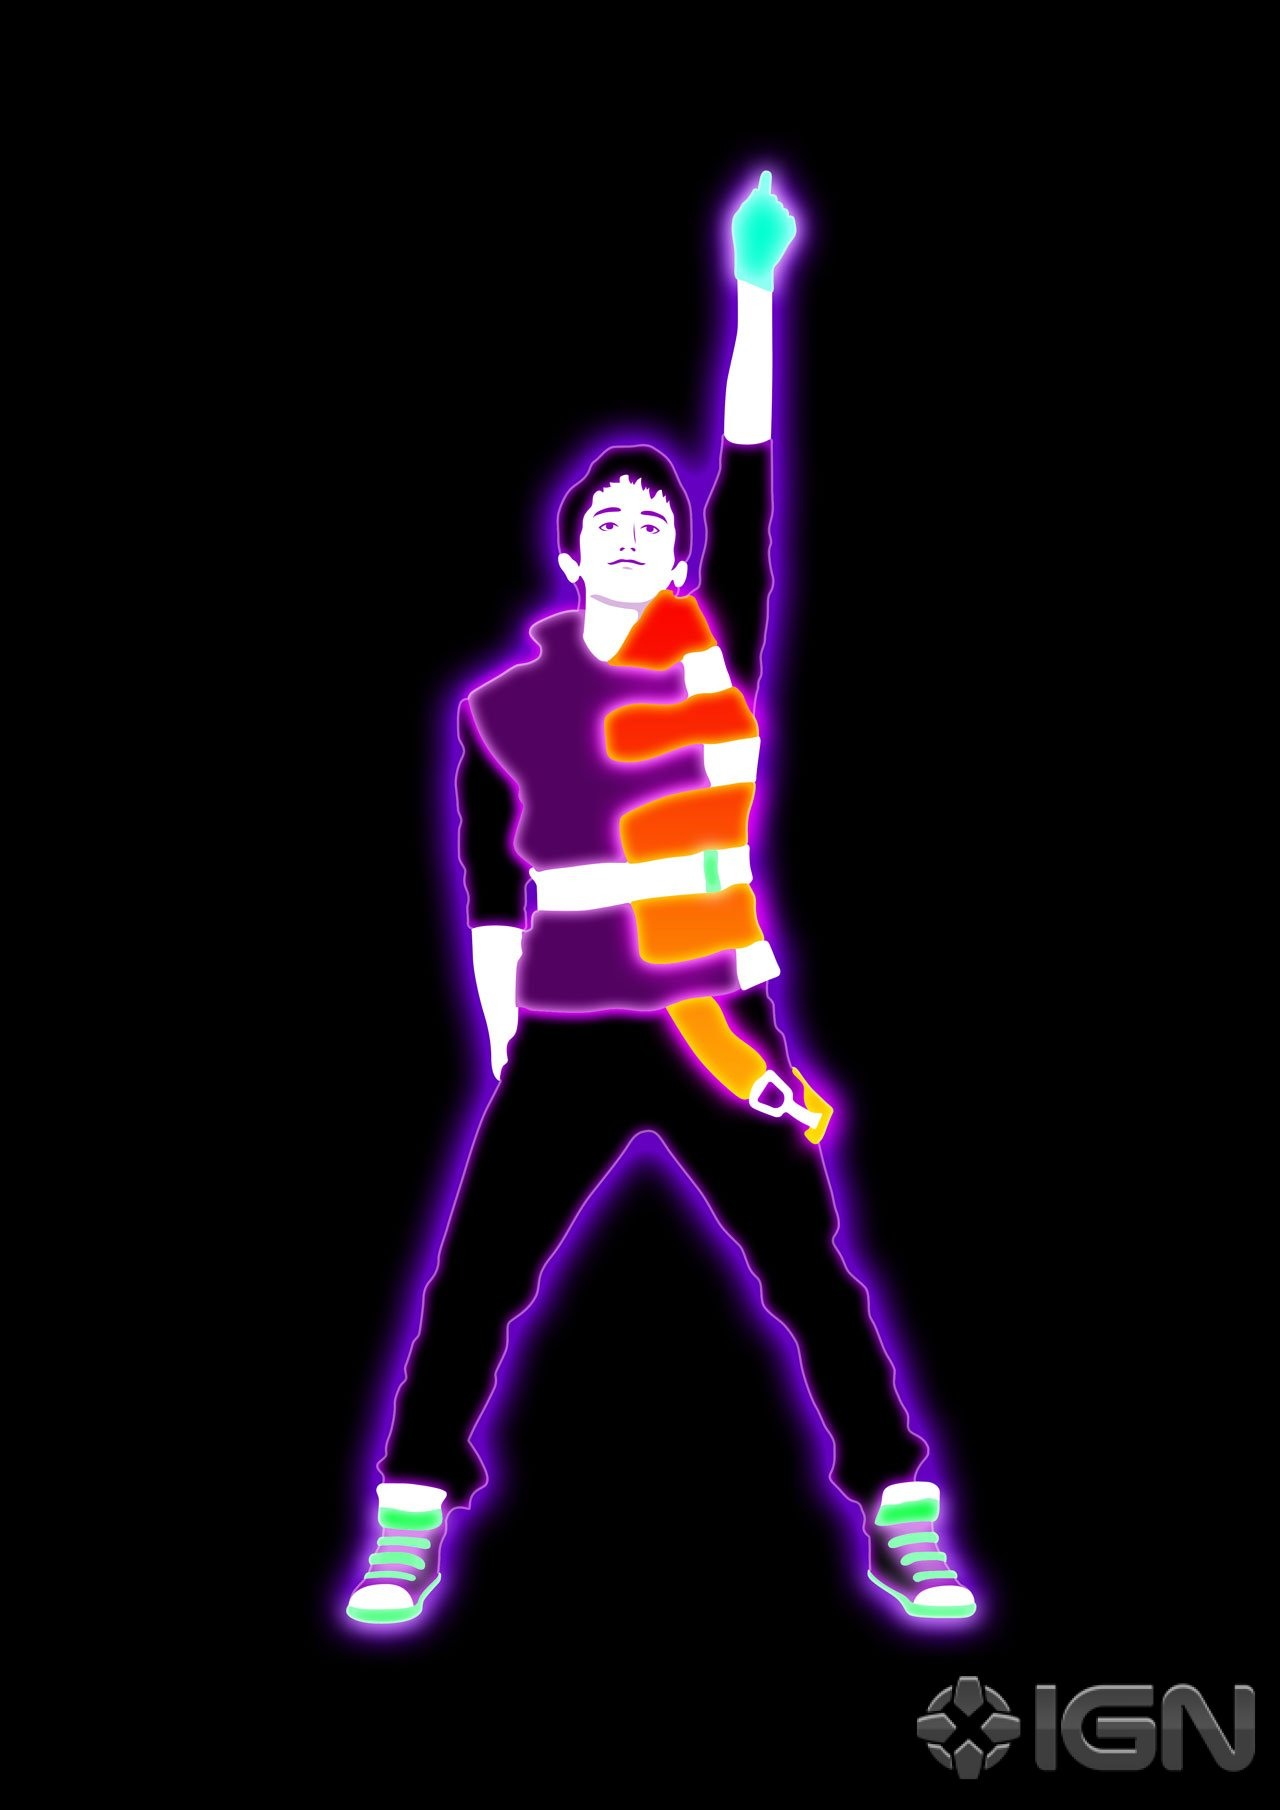 Just Dance 3 Screenshots Pictures Wallpapers   Wii   IGN 1280x1810